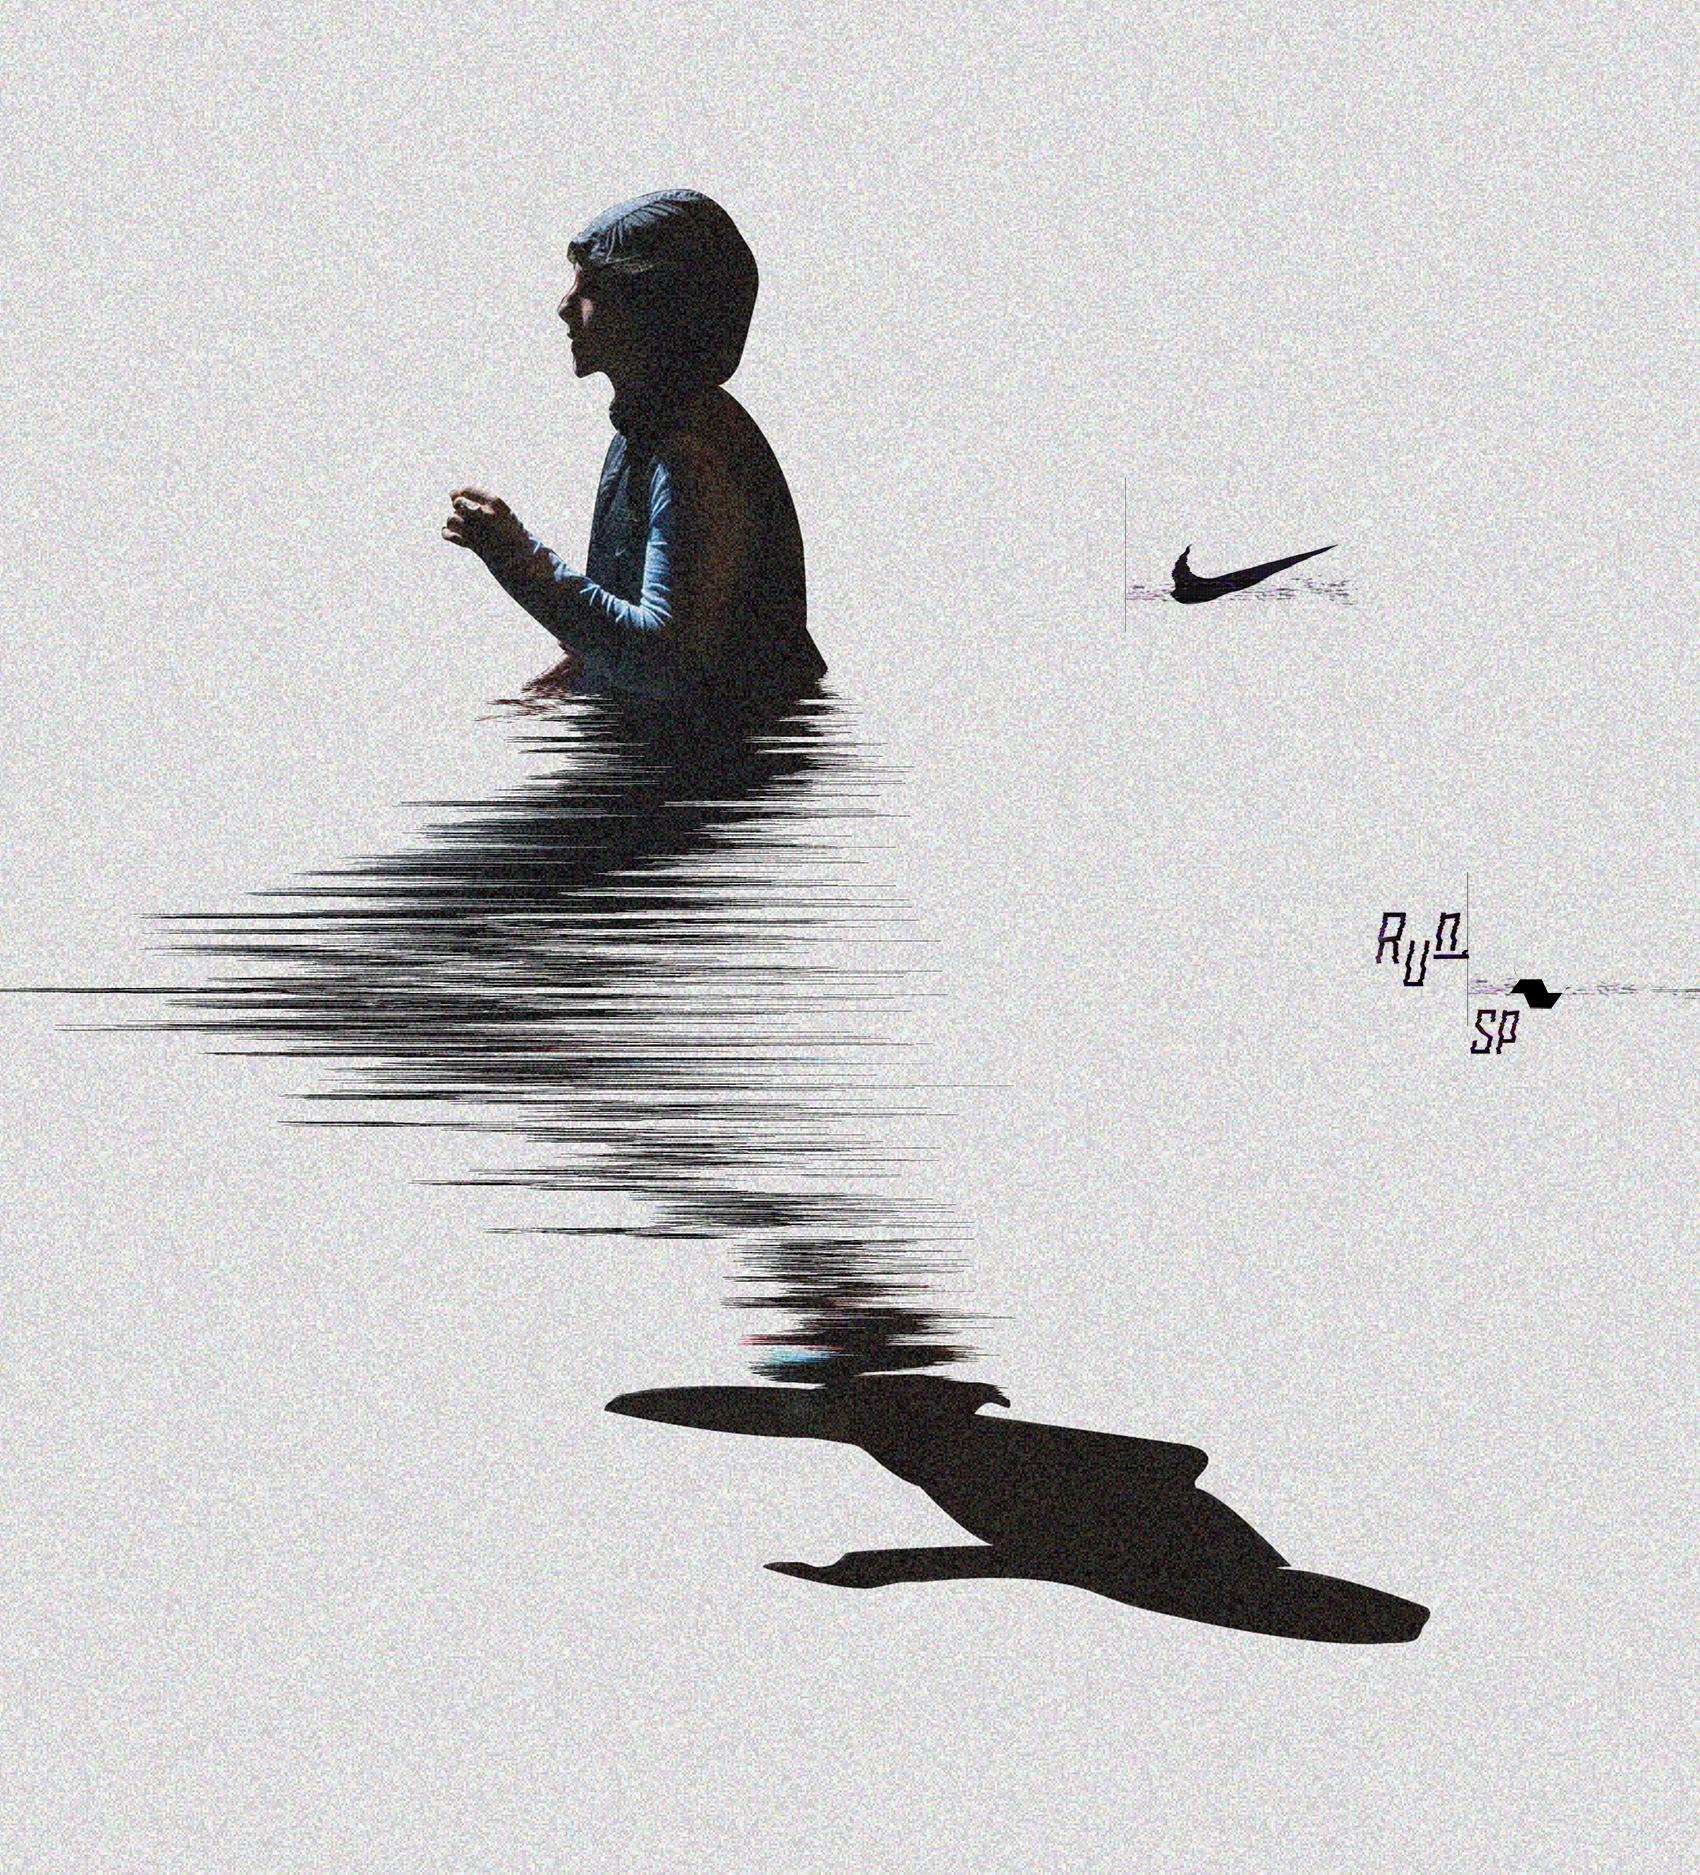 mulher_corre_onda2